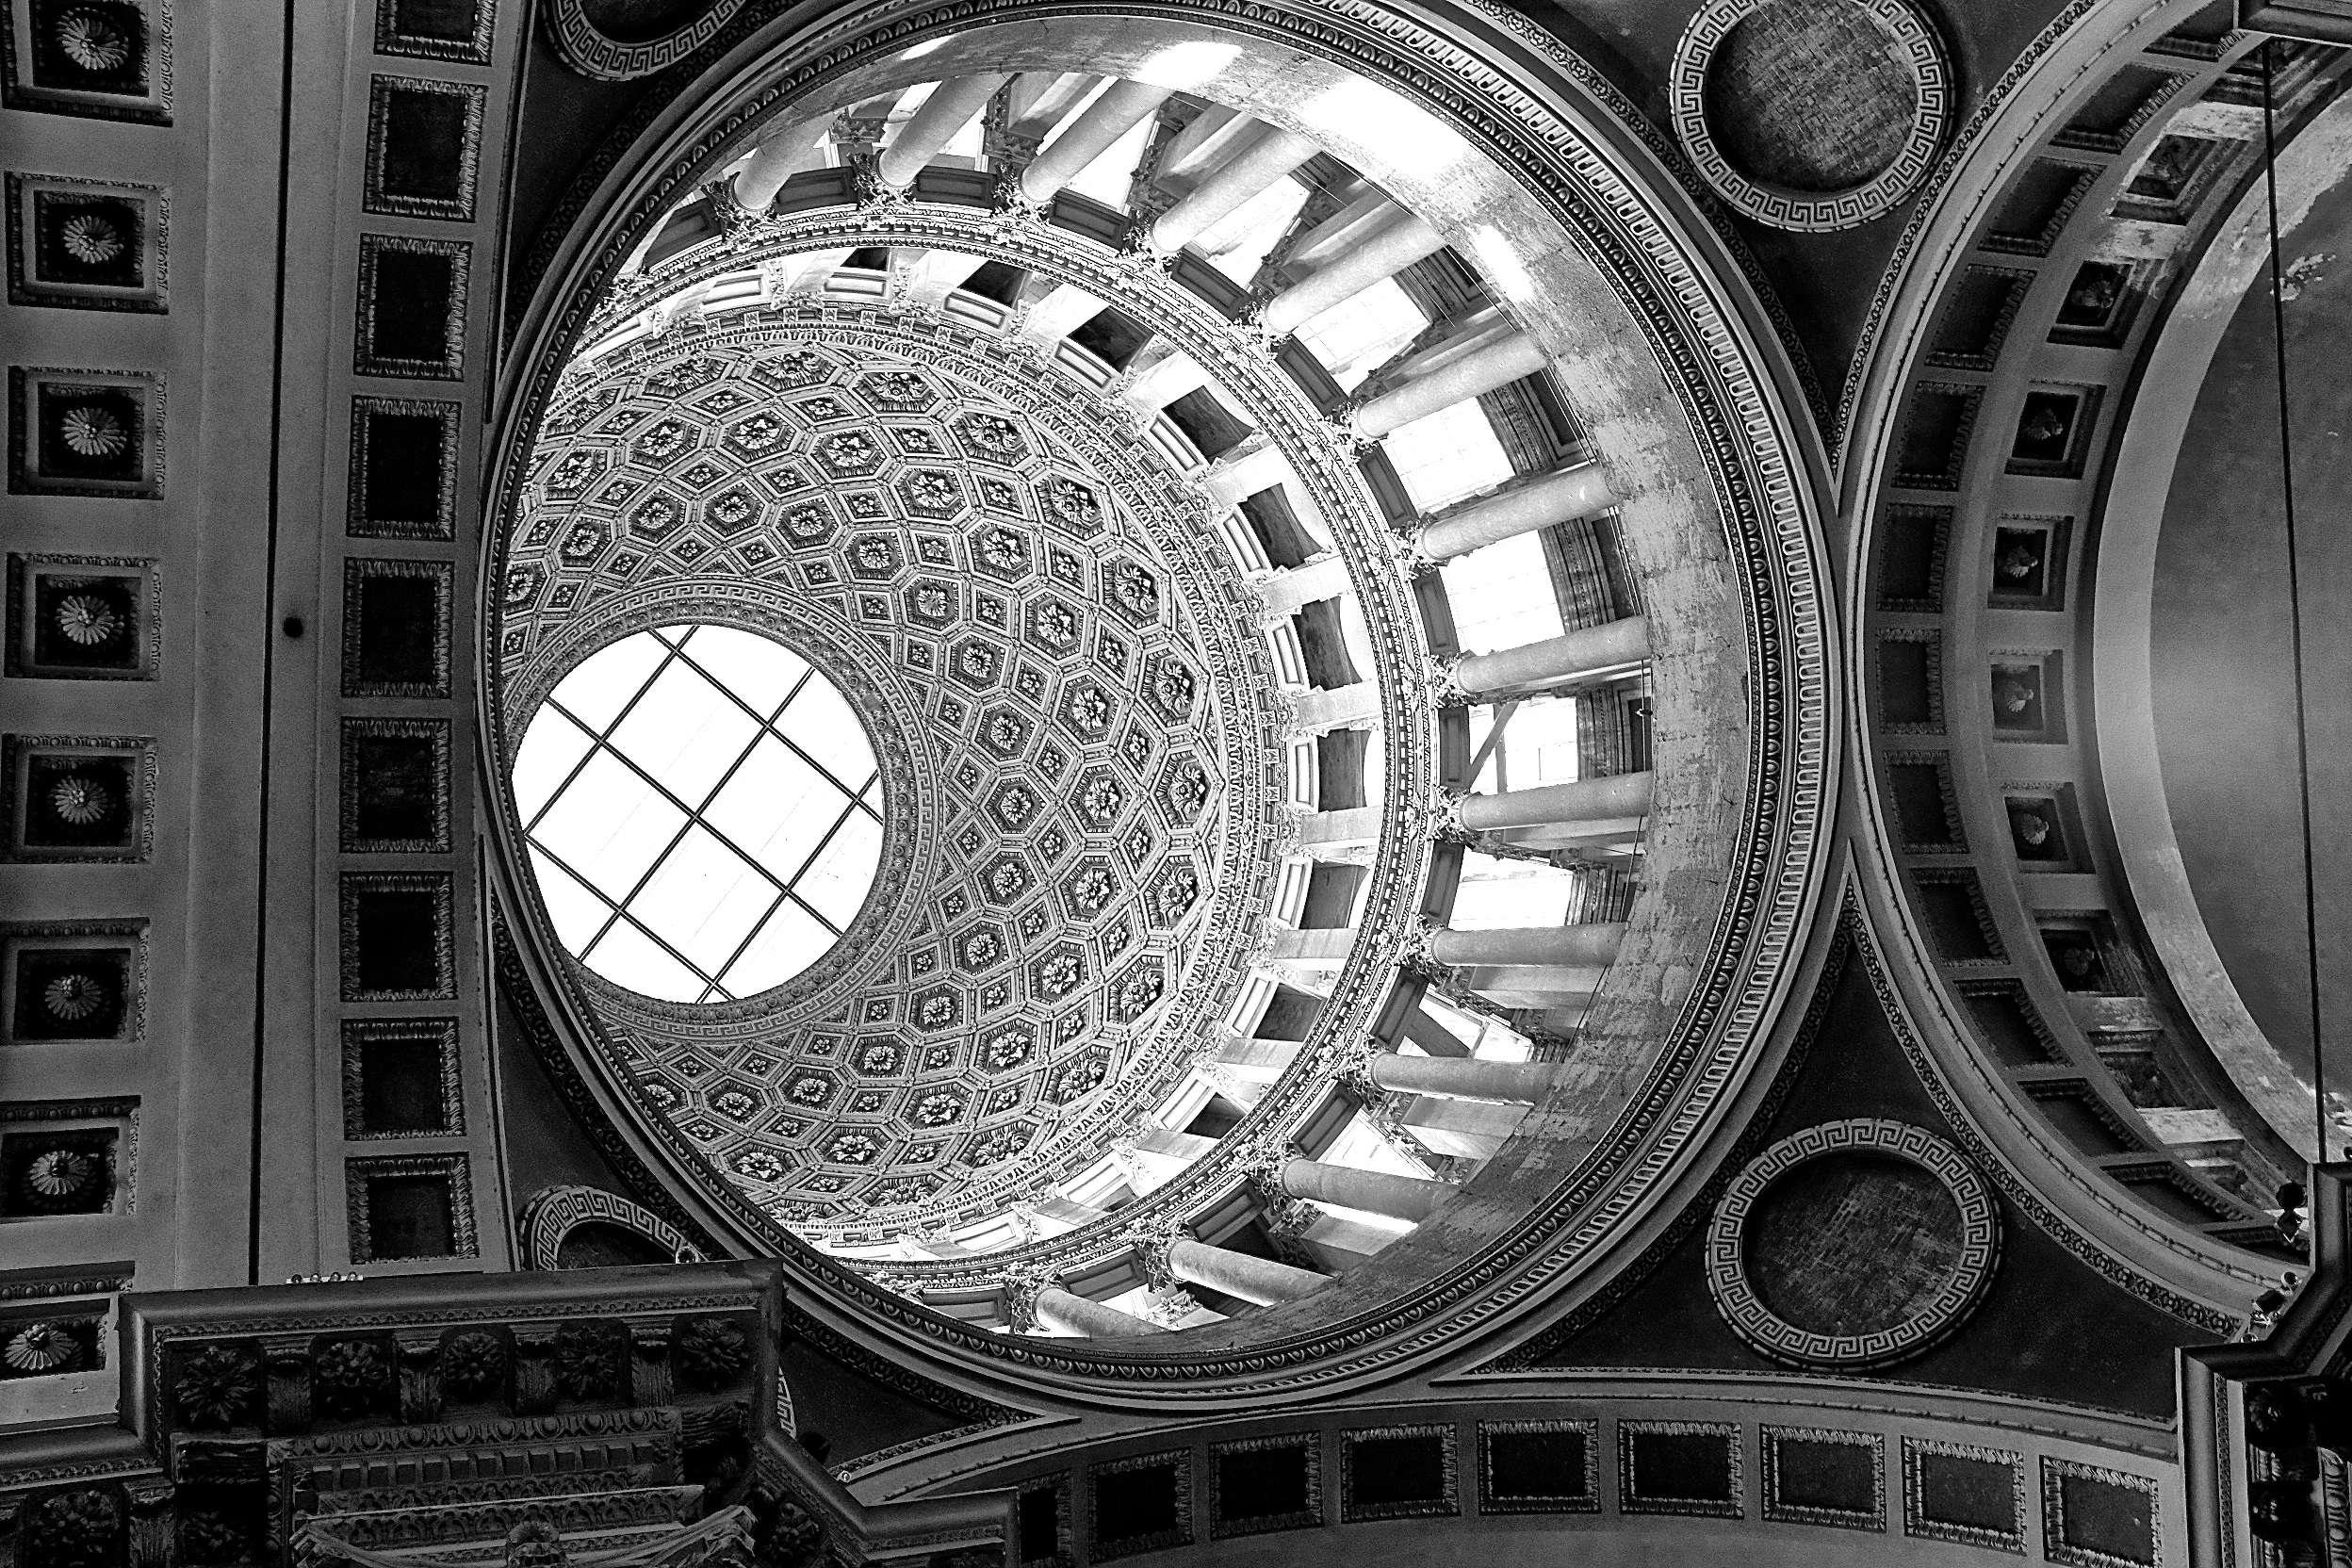 Cupola Castano